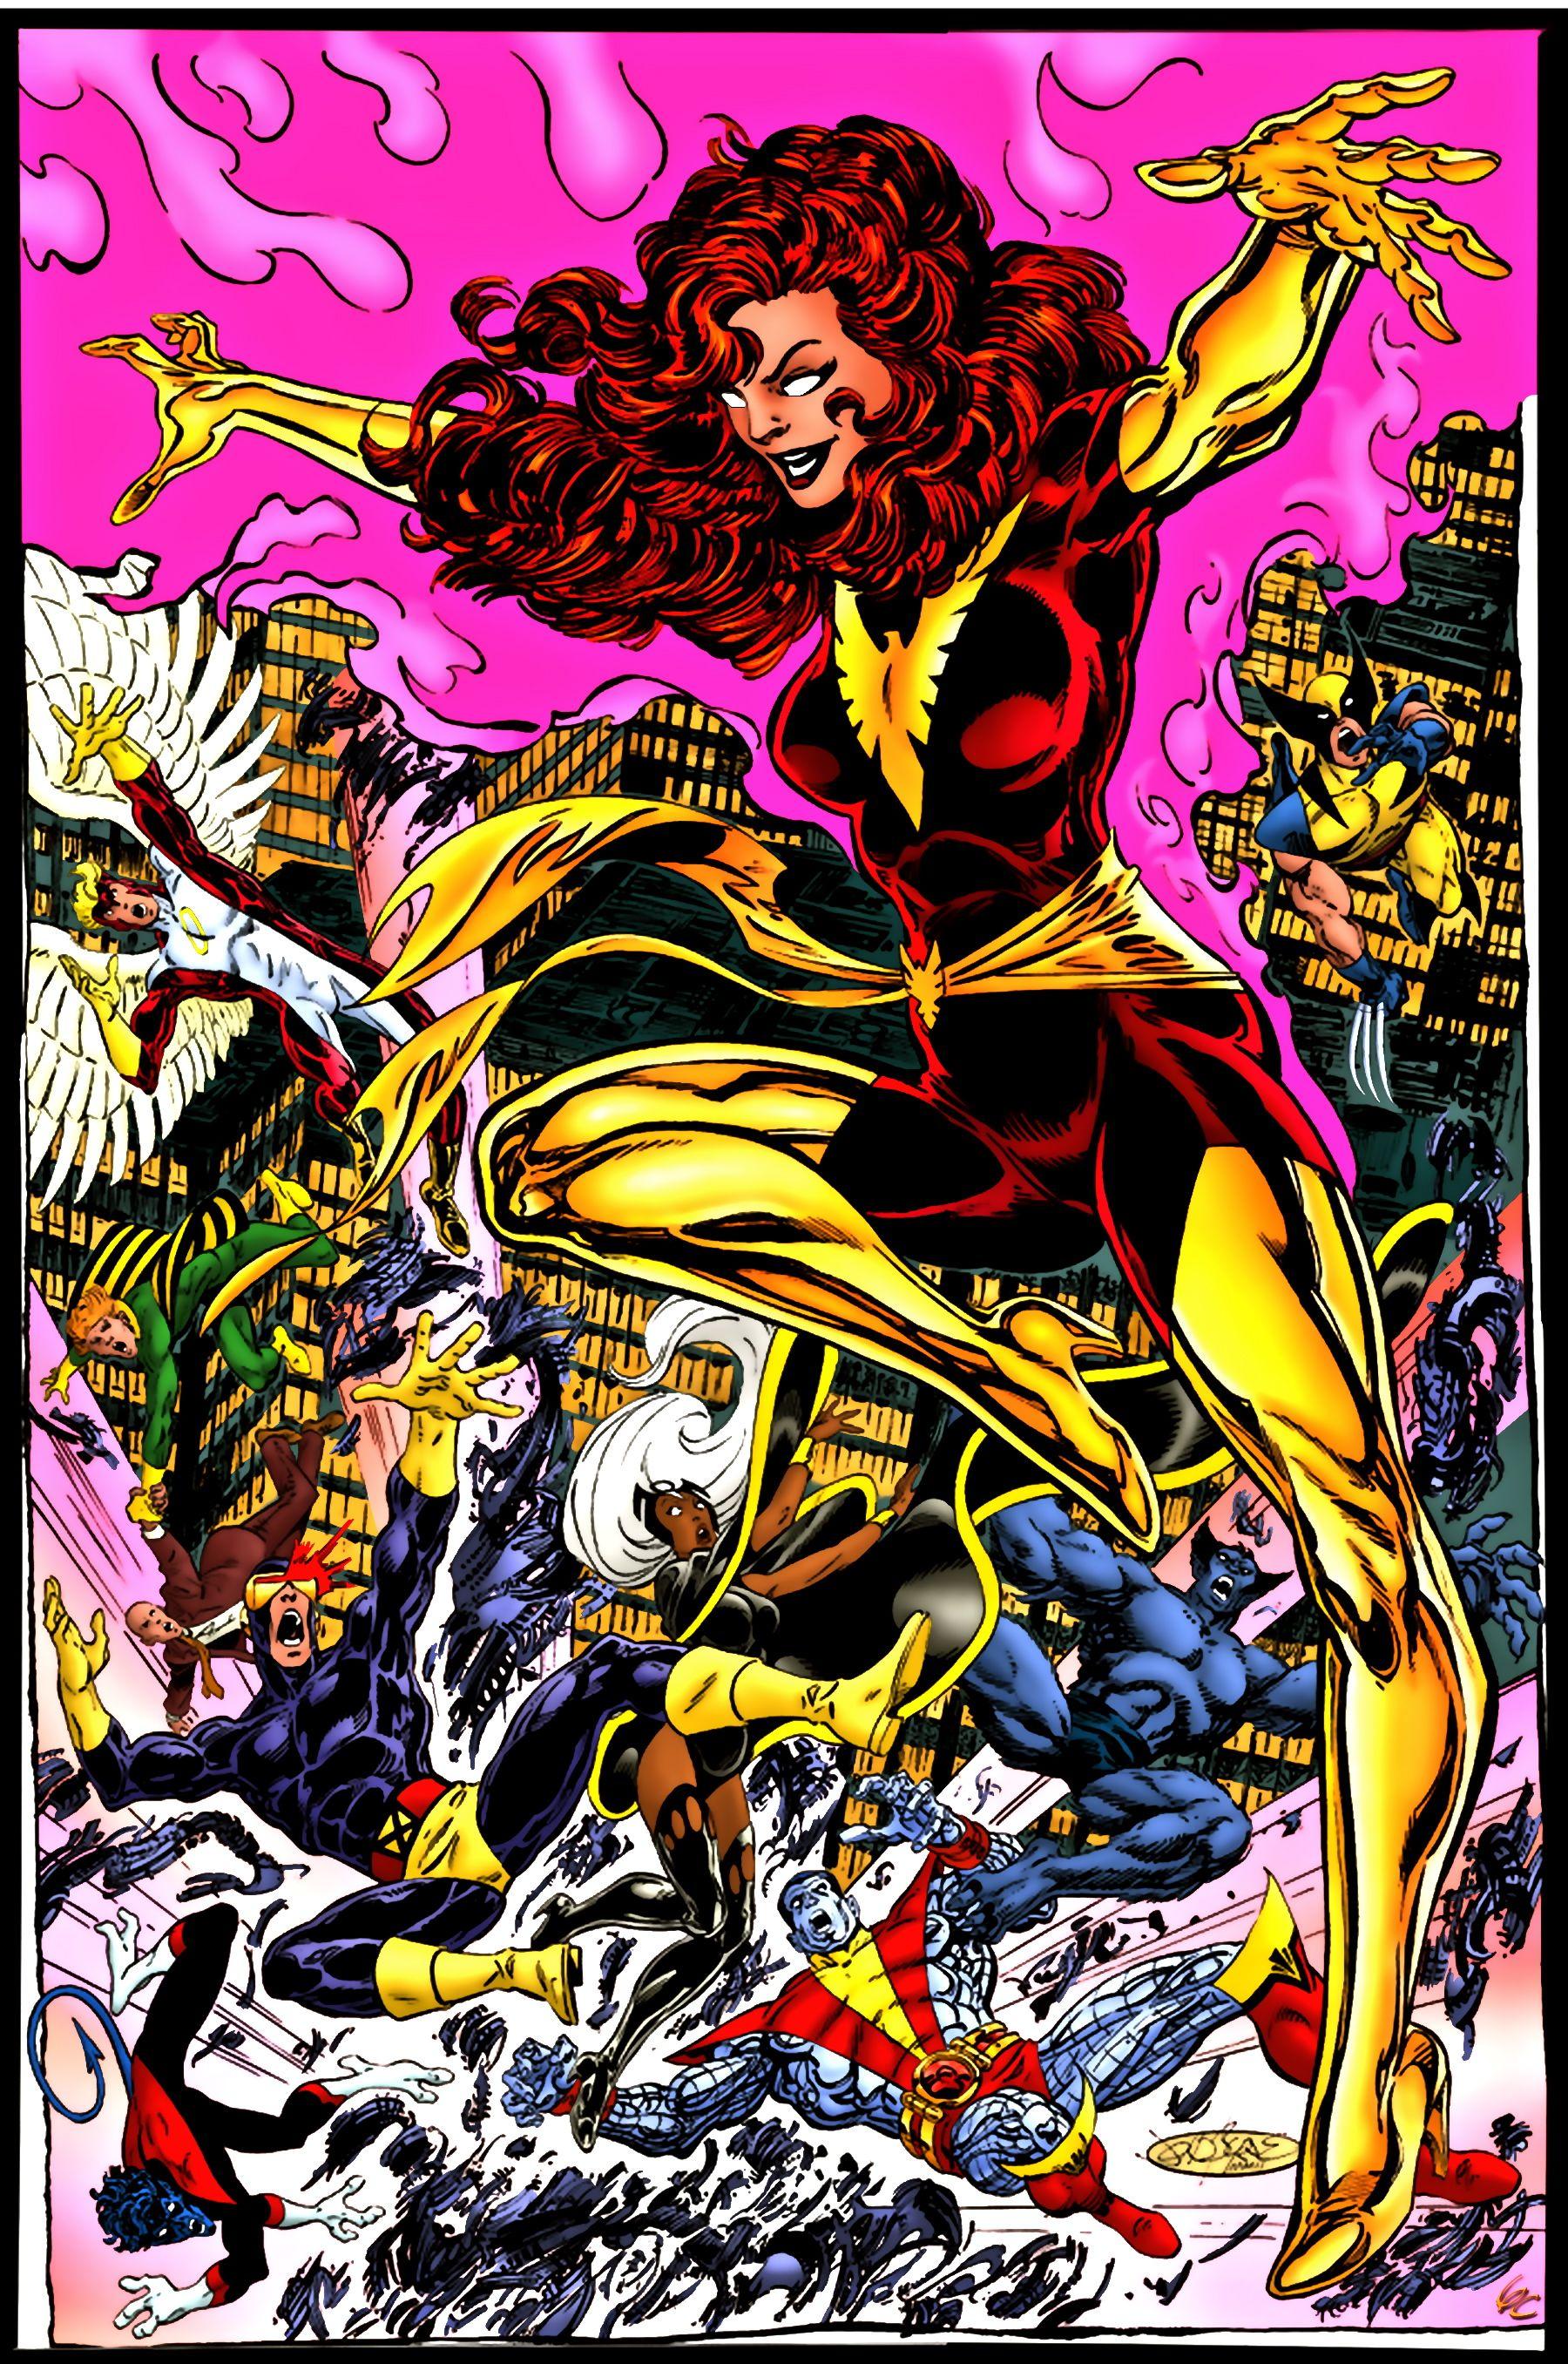 Dark Phoenix Jean Grey Vs The X Men Marvel Jean Grey John Byrne Marvel Comics Art X men dark phoenix marvel comics